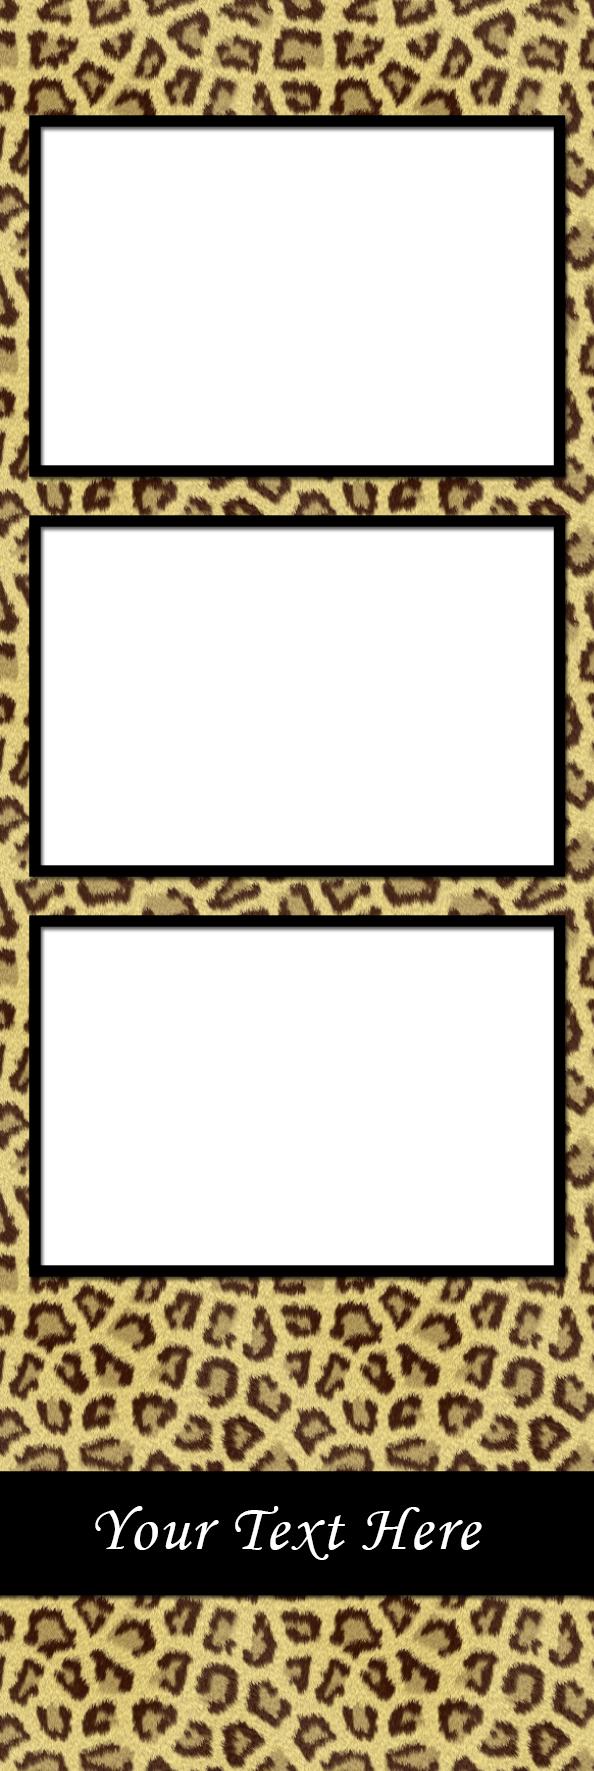 Texture_Leopard-V-6P.jpg